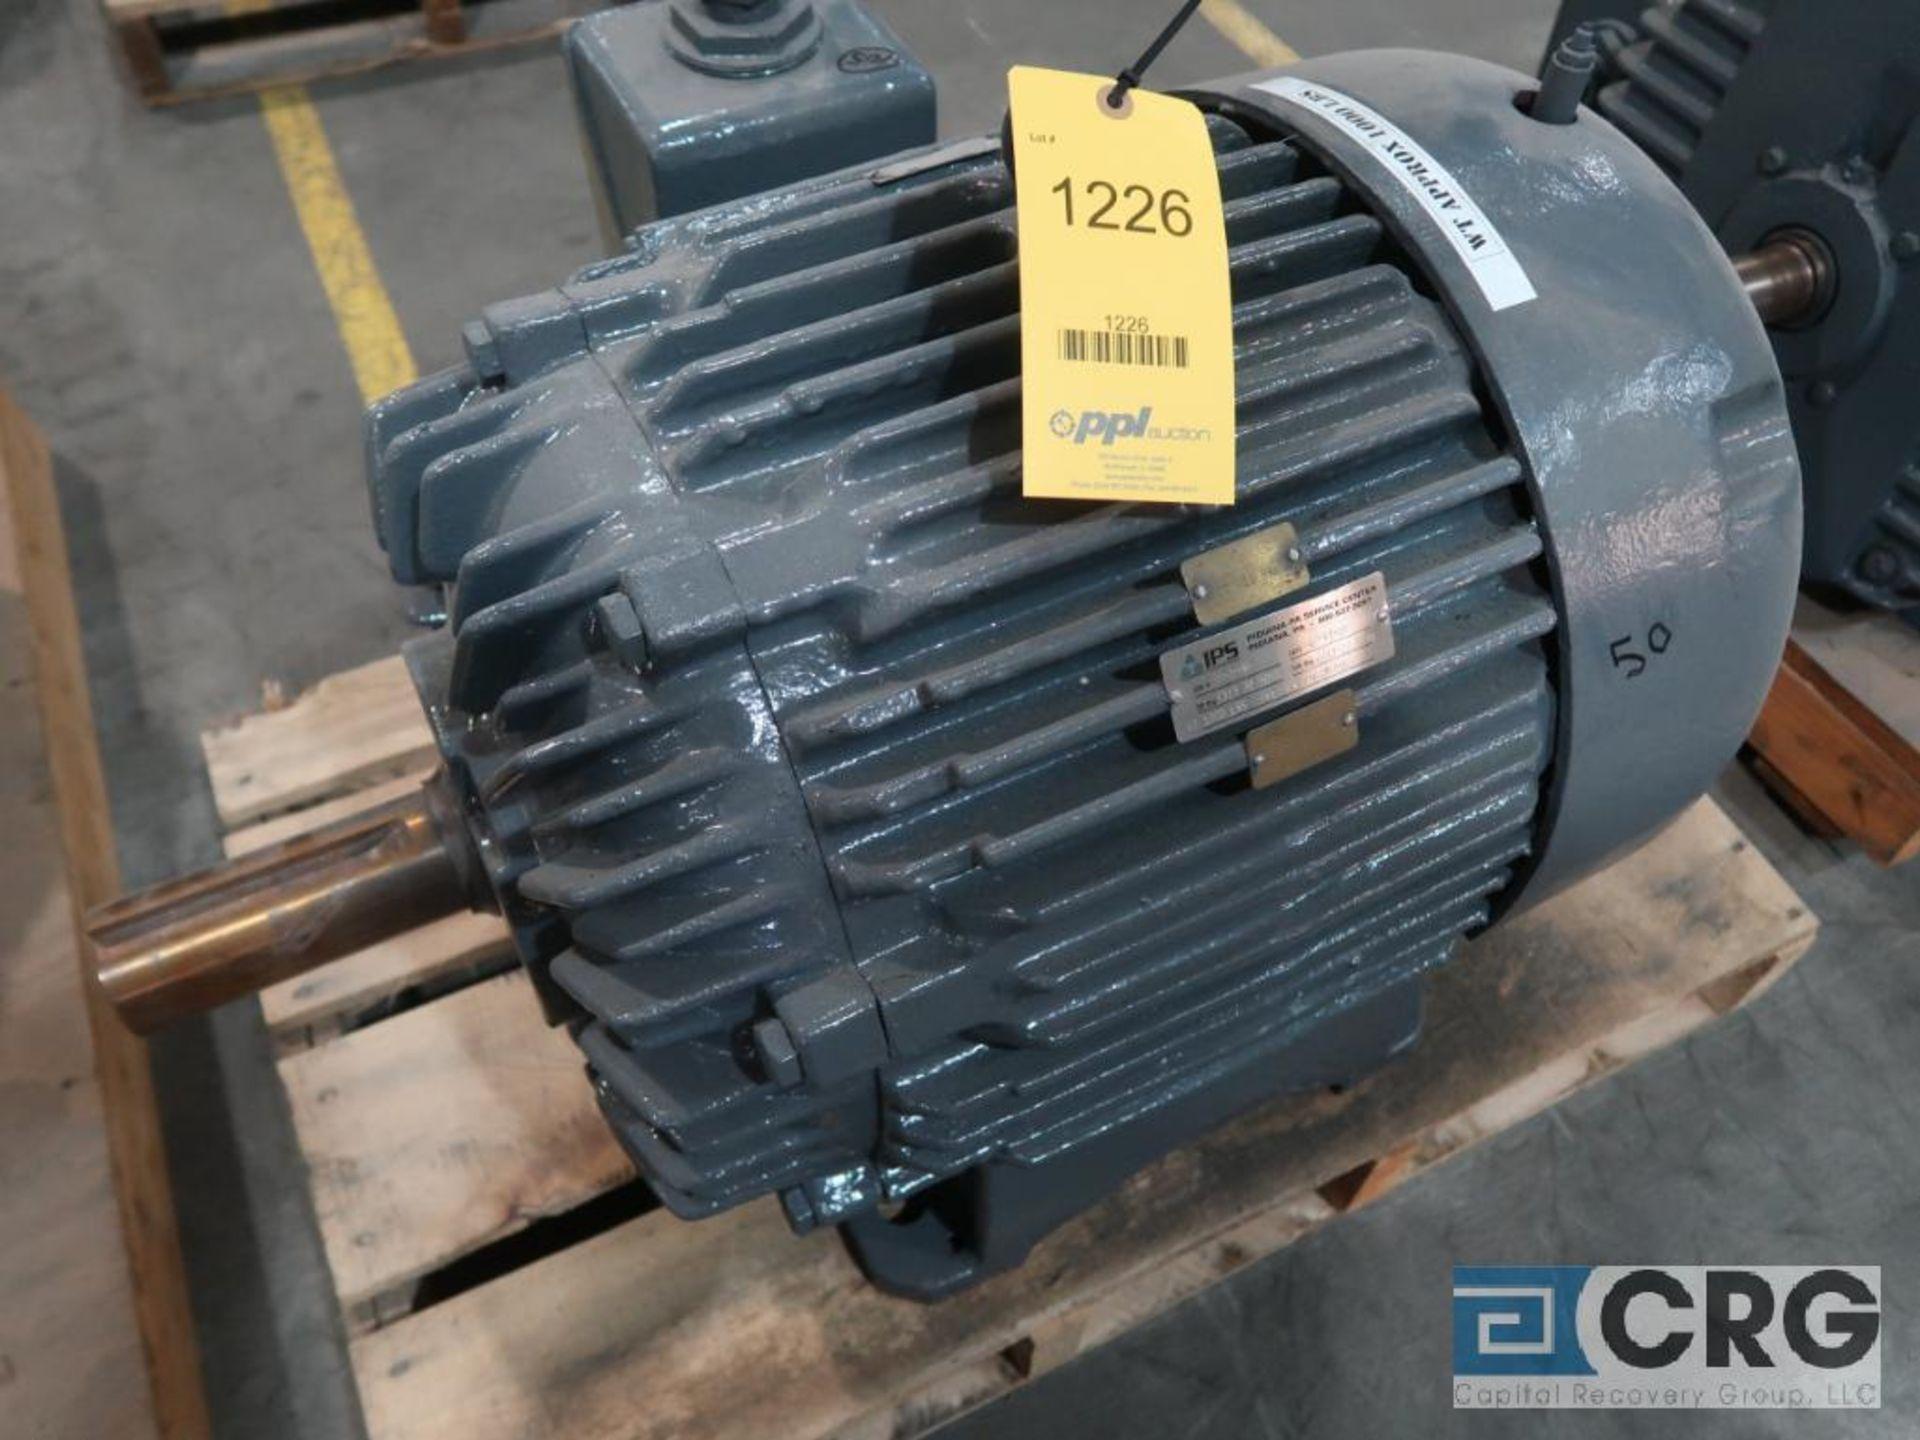 Siemens A-C motor, 50 HP, 1,175 RPMs, 460 volt, 3 ph., 365T frame (Finish Building)